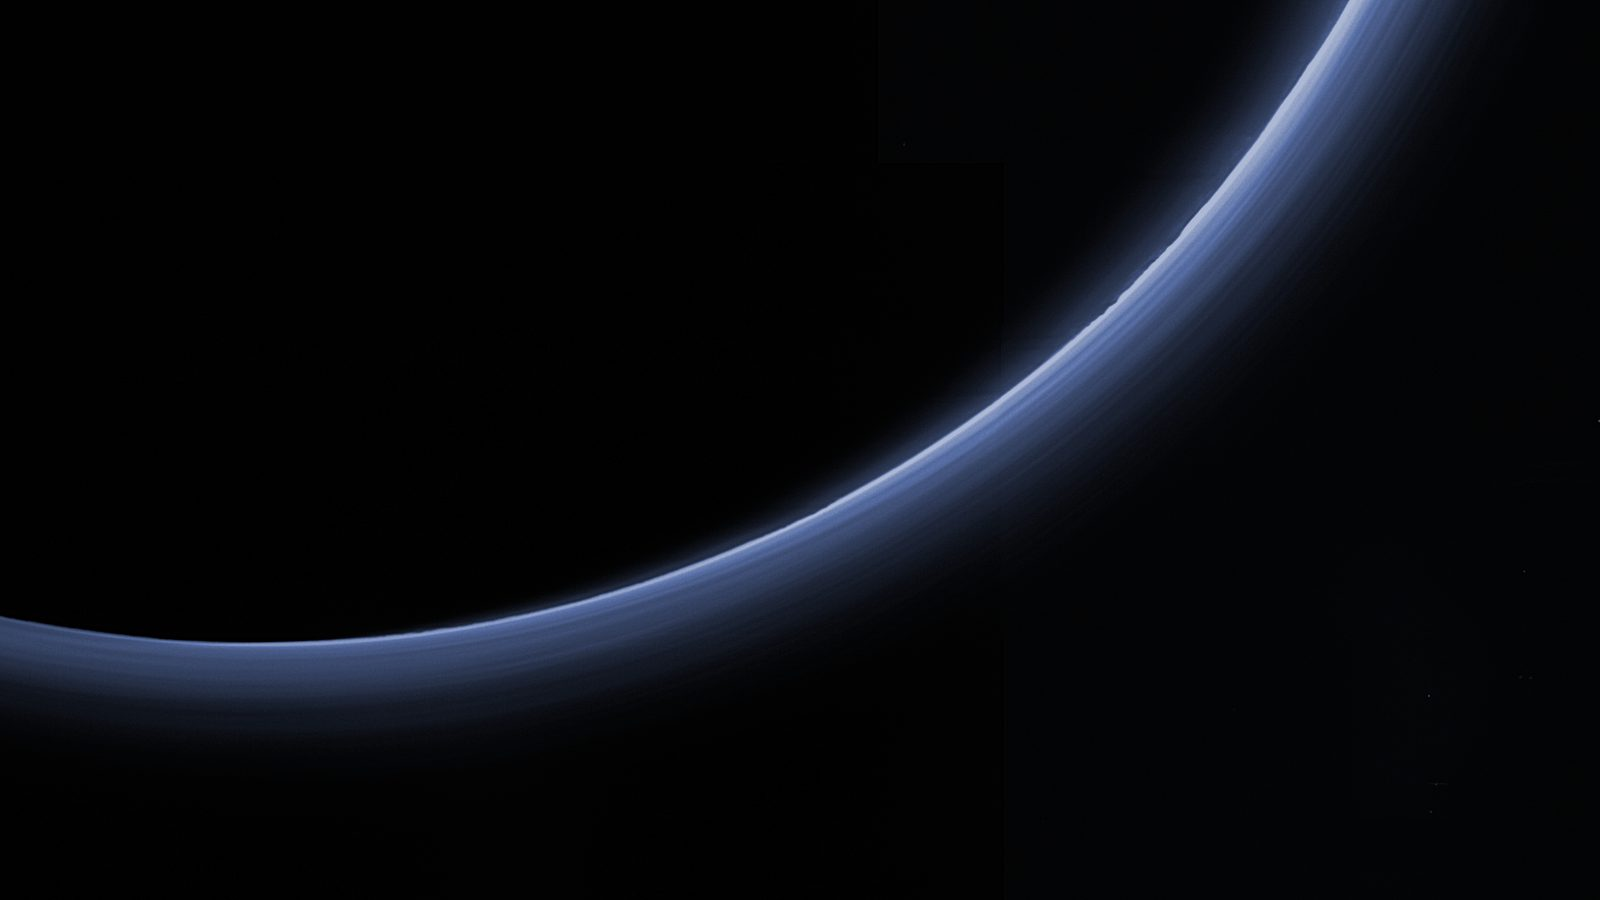 Pluto's atmospheric haze. Credit: NASA/JHUAPL/SwRI